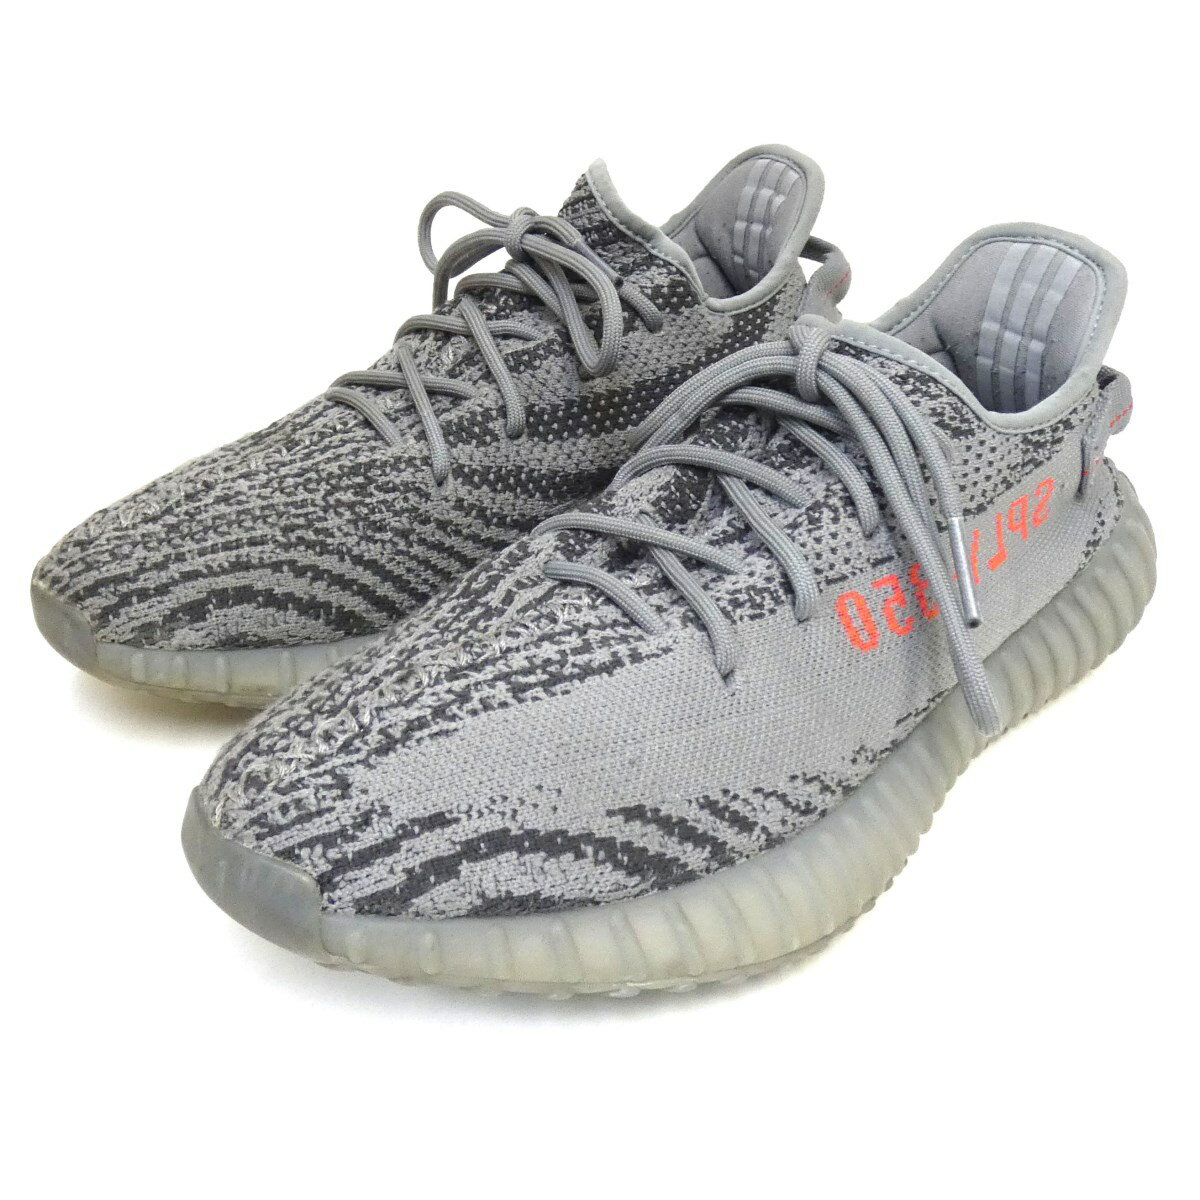 on sale 3ebad 6f6ff adidas originals by Kanye West